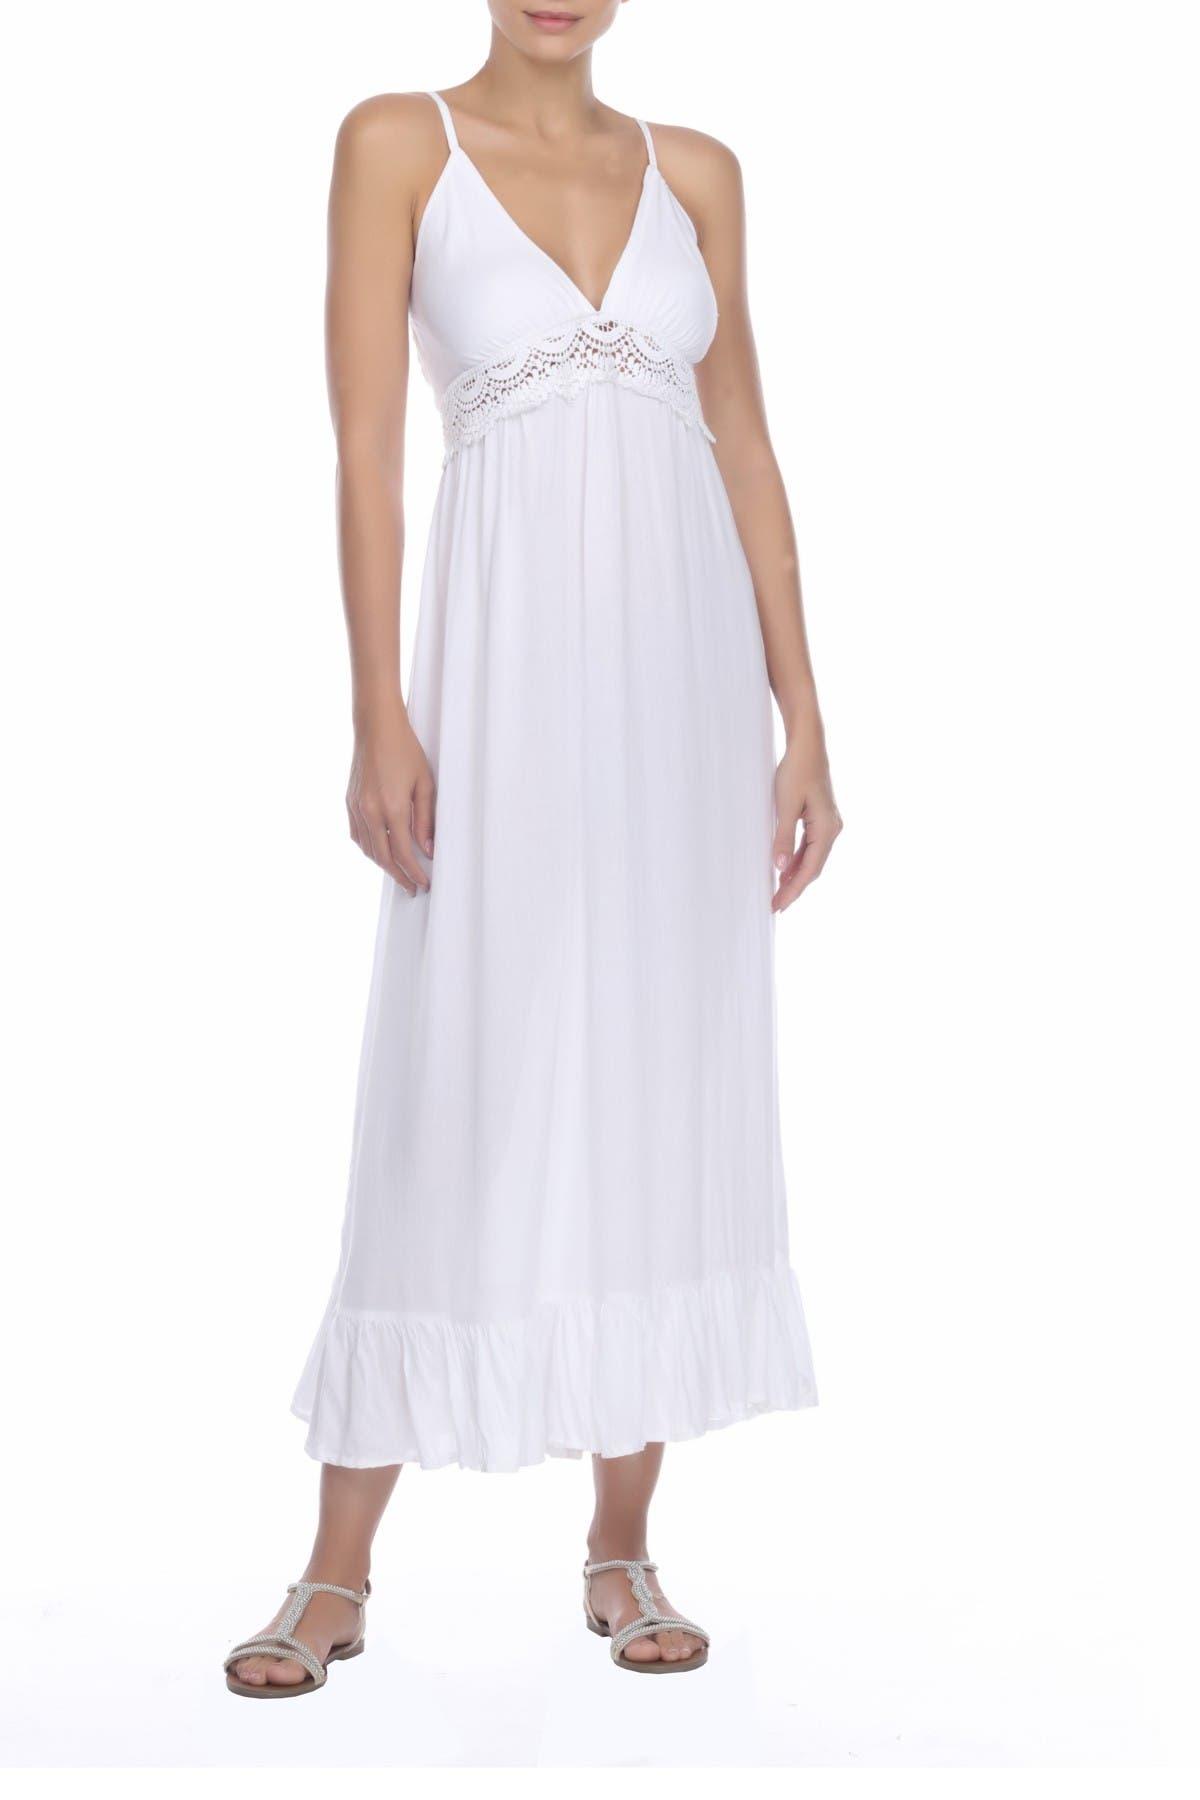 Image of BOHO ME Lace V-Neck Spaghetti Straps Maxi Dress